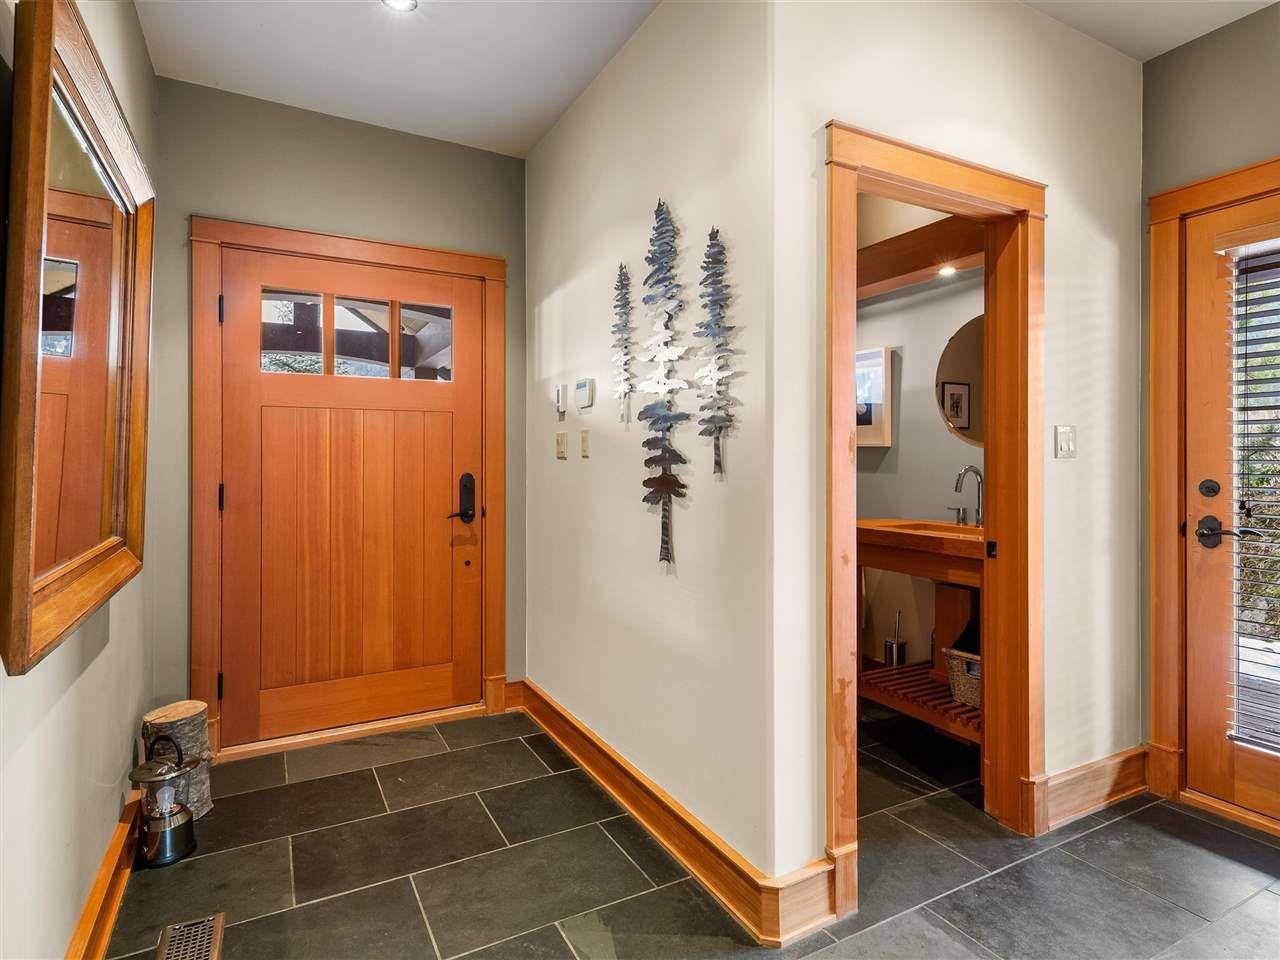 Photo 21: Photos: 1766 PINEWOOD DRIVE: Pemberton House for sale : MLS®# R2543608